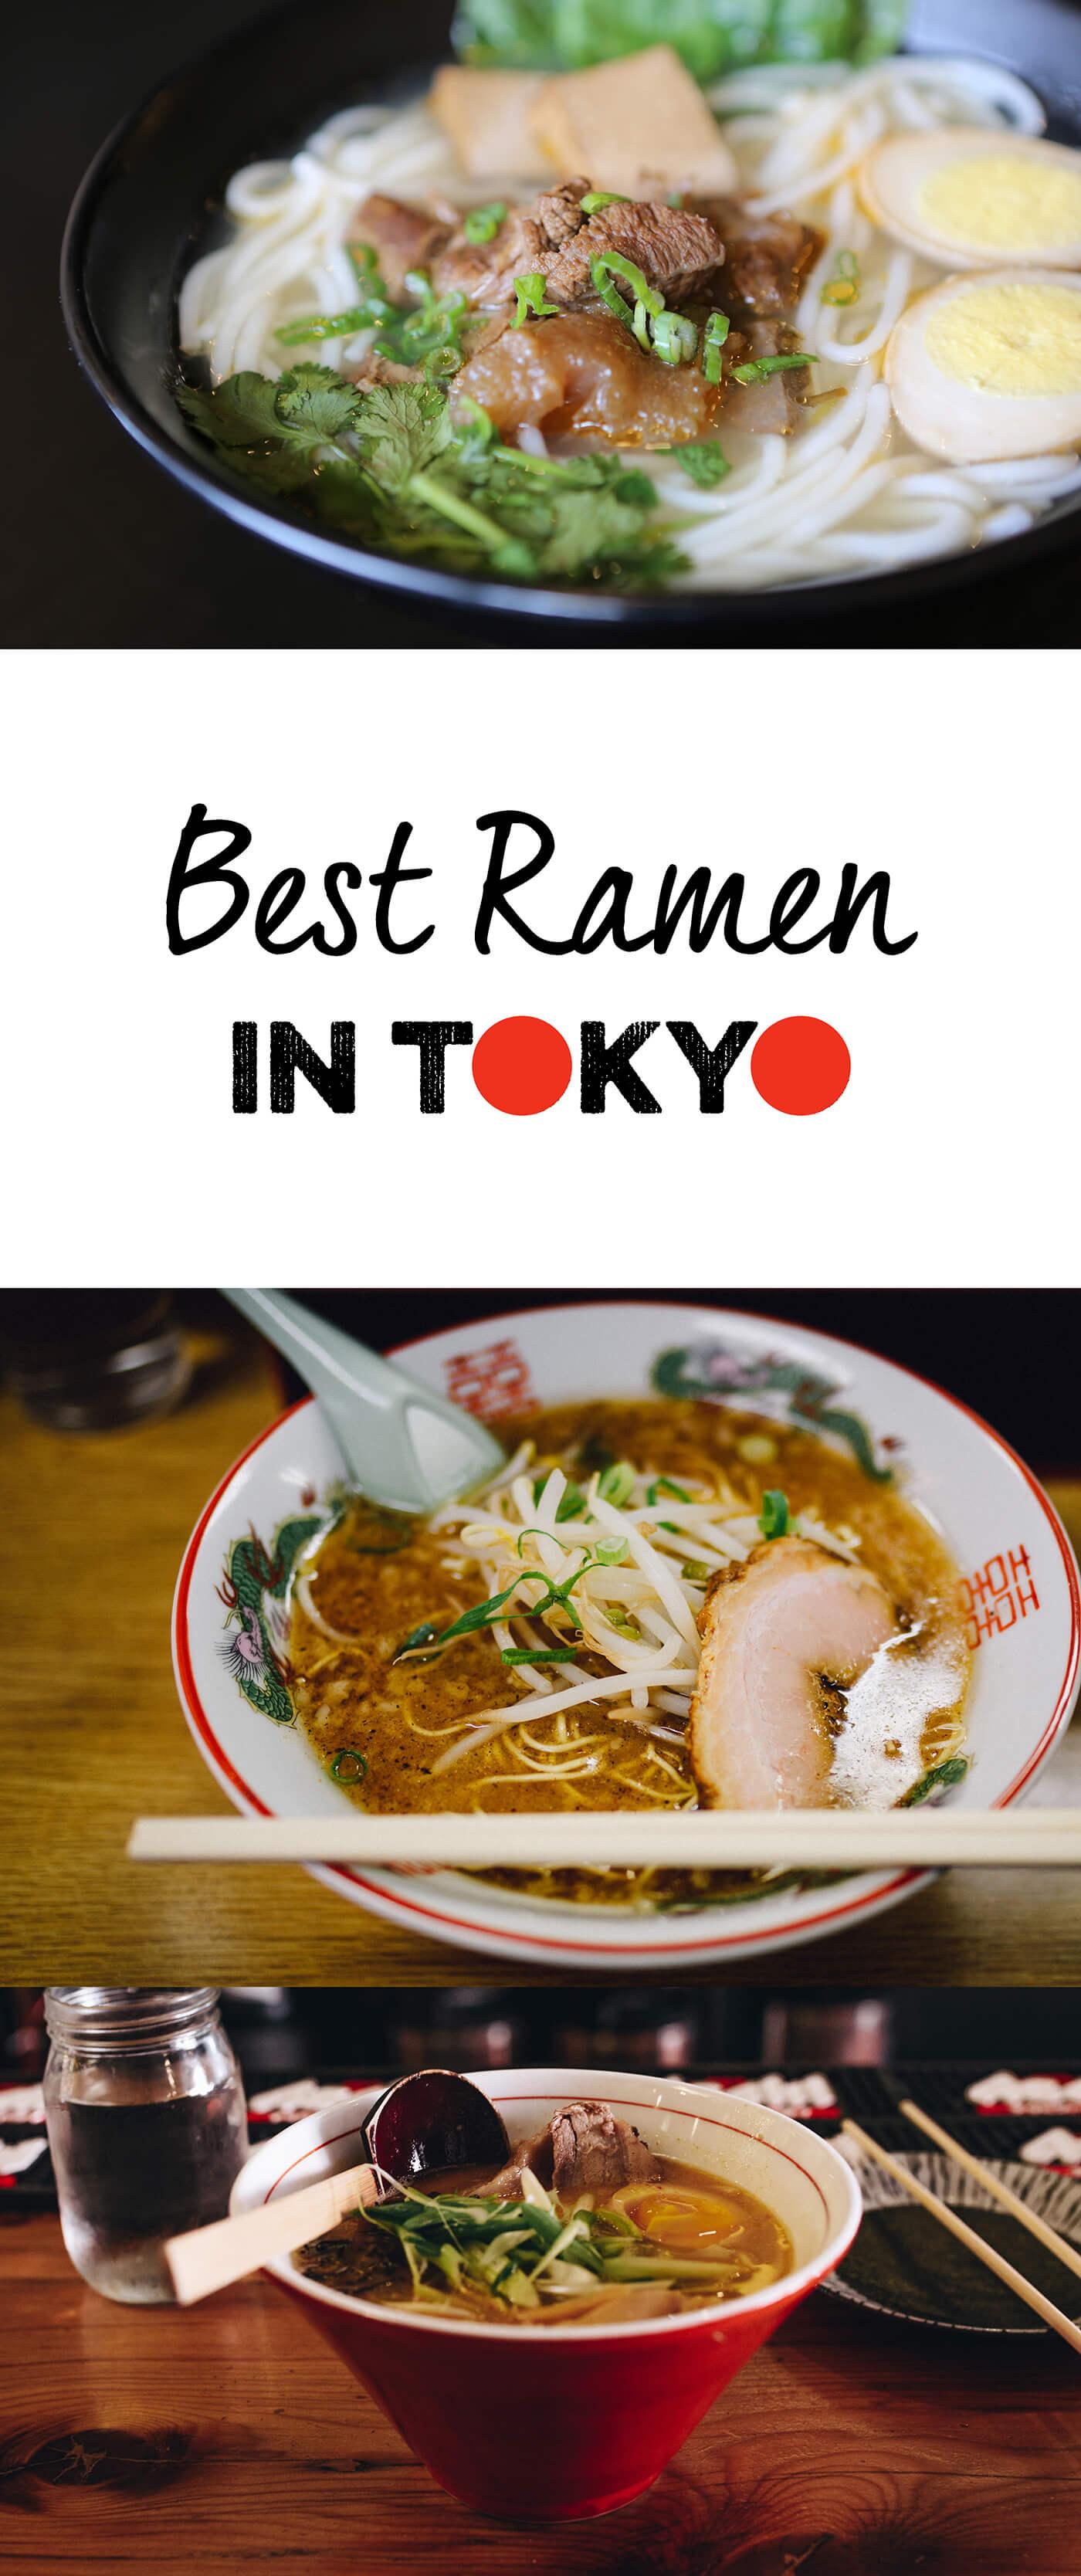 Best-Ramen-Tokyo-2.jpg